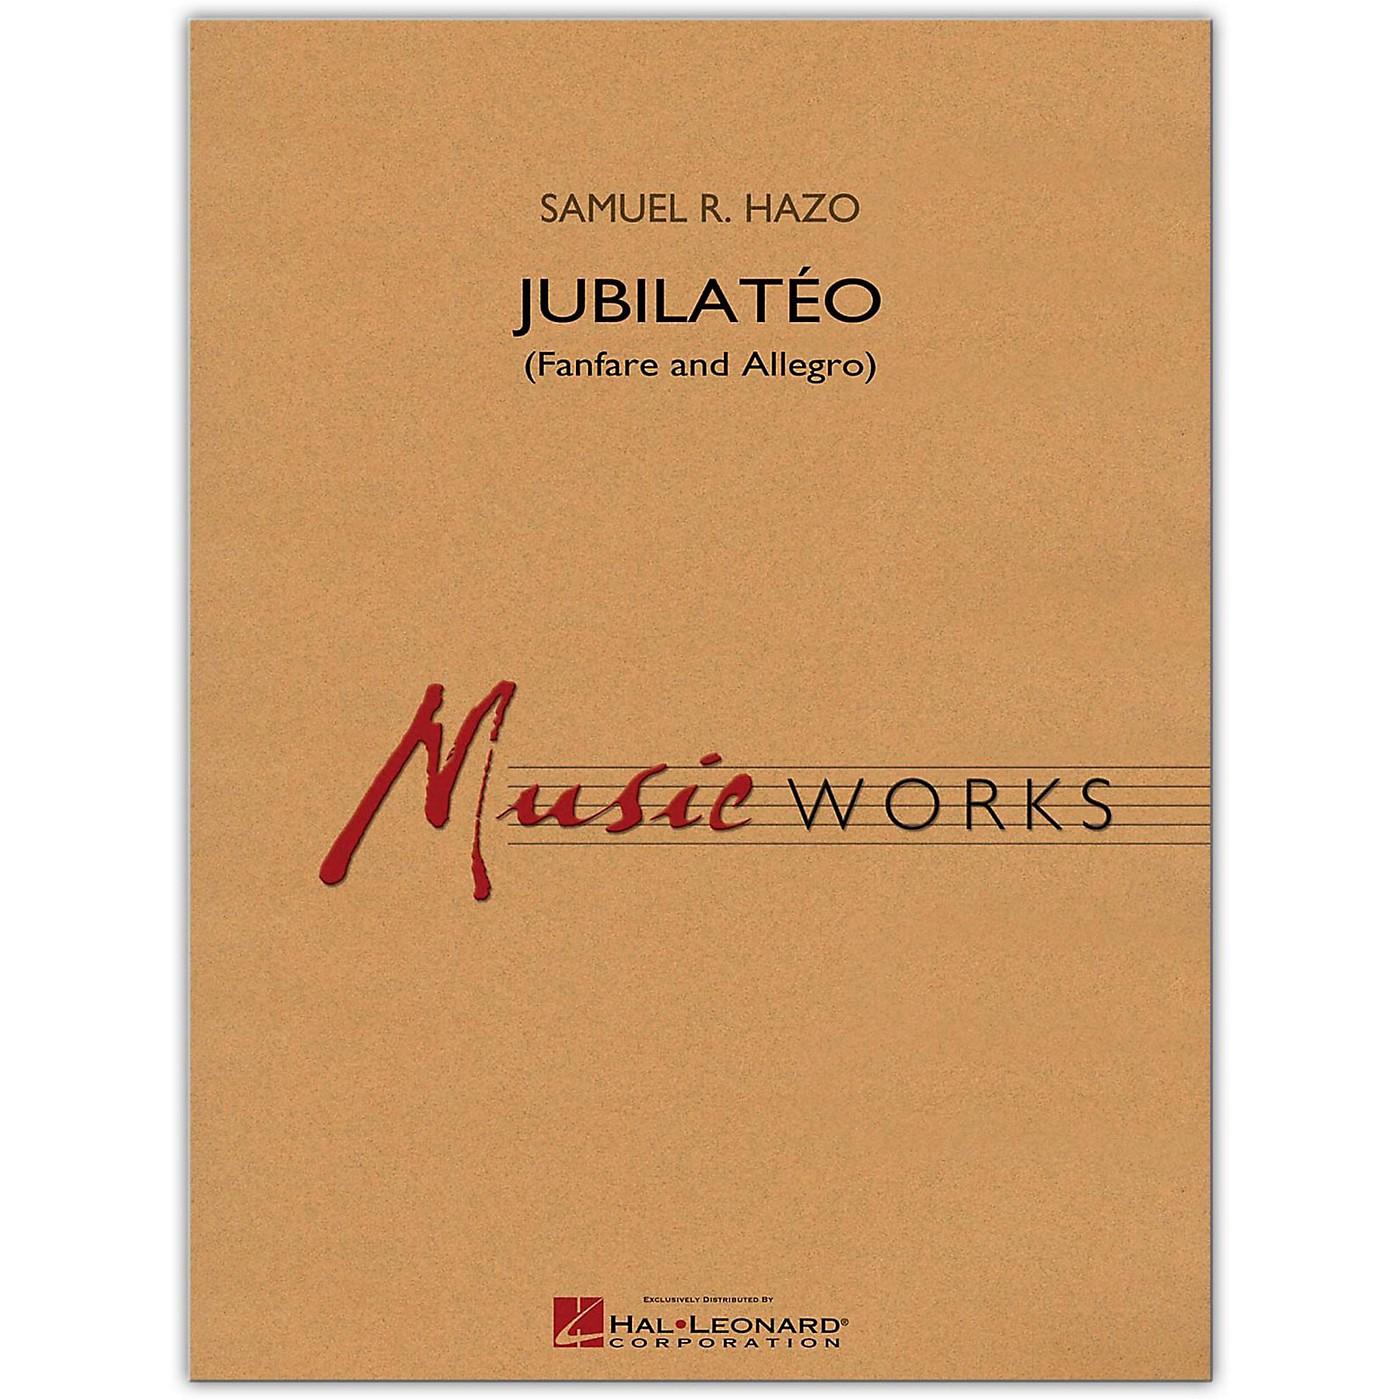 Hal Leonard Jubilato (Fanfare and Allegro) MusicWorks Concert Band Grade 5 thumbnail